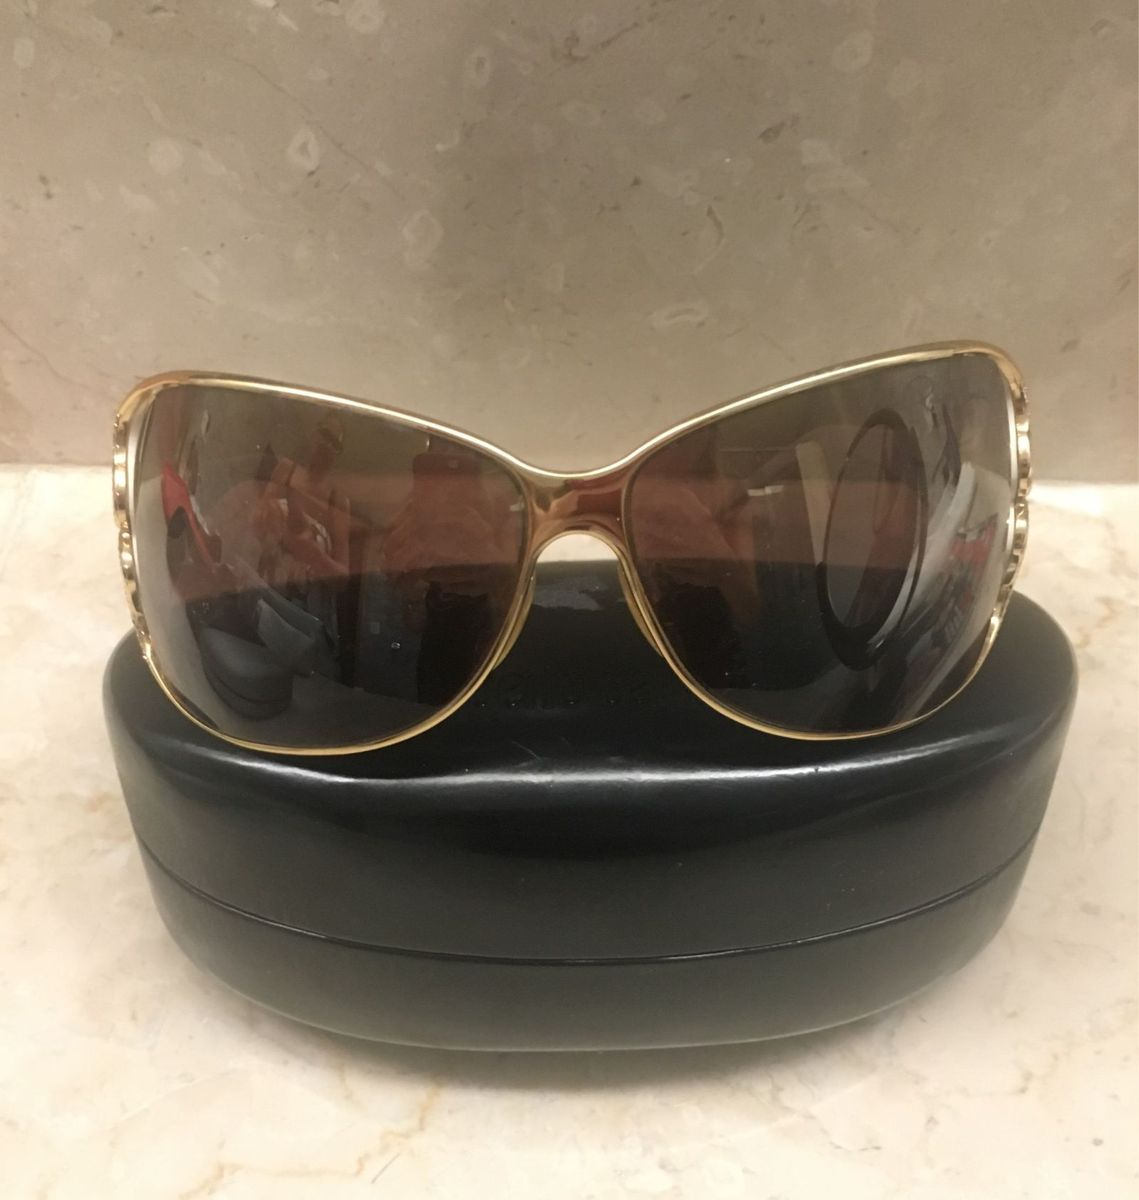 8667804df35a2 oculos roberto cavalli - óculos roberto cavalli.  Czm6ly9wag90b3muzw5qb2vplmnvbs5ici9wcm9kdwn0cy81ndgwntgwlzhkntc2ntq3y2mxzgyymmfjytg0m2nkmgzkngq1ote2lmpwzw  ...